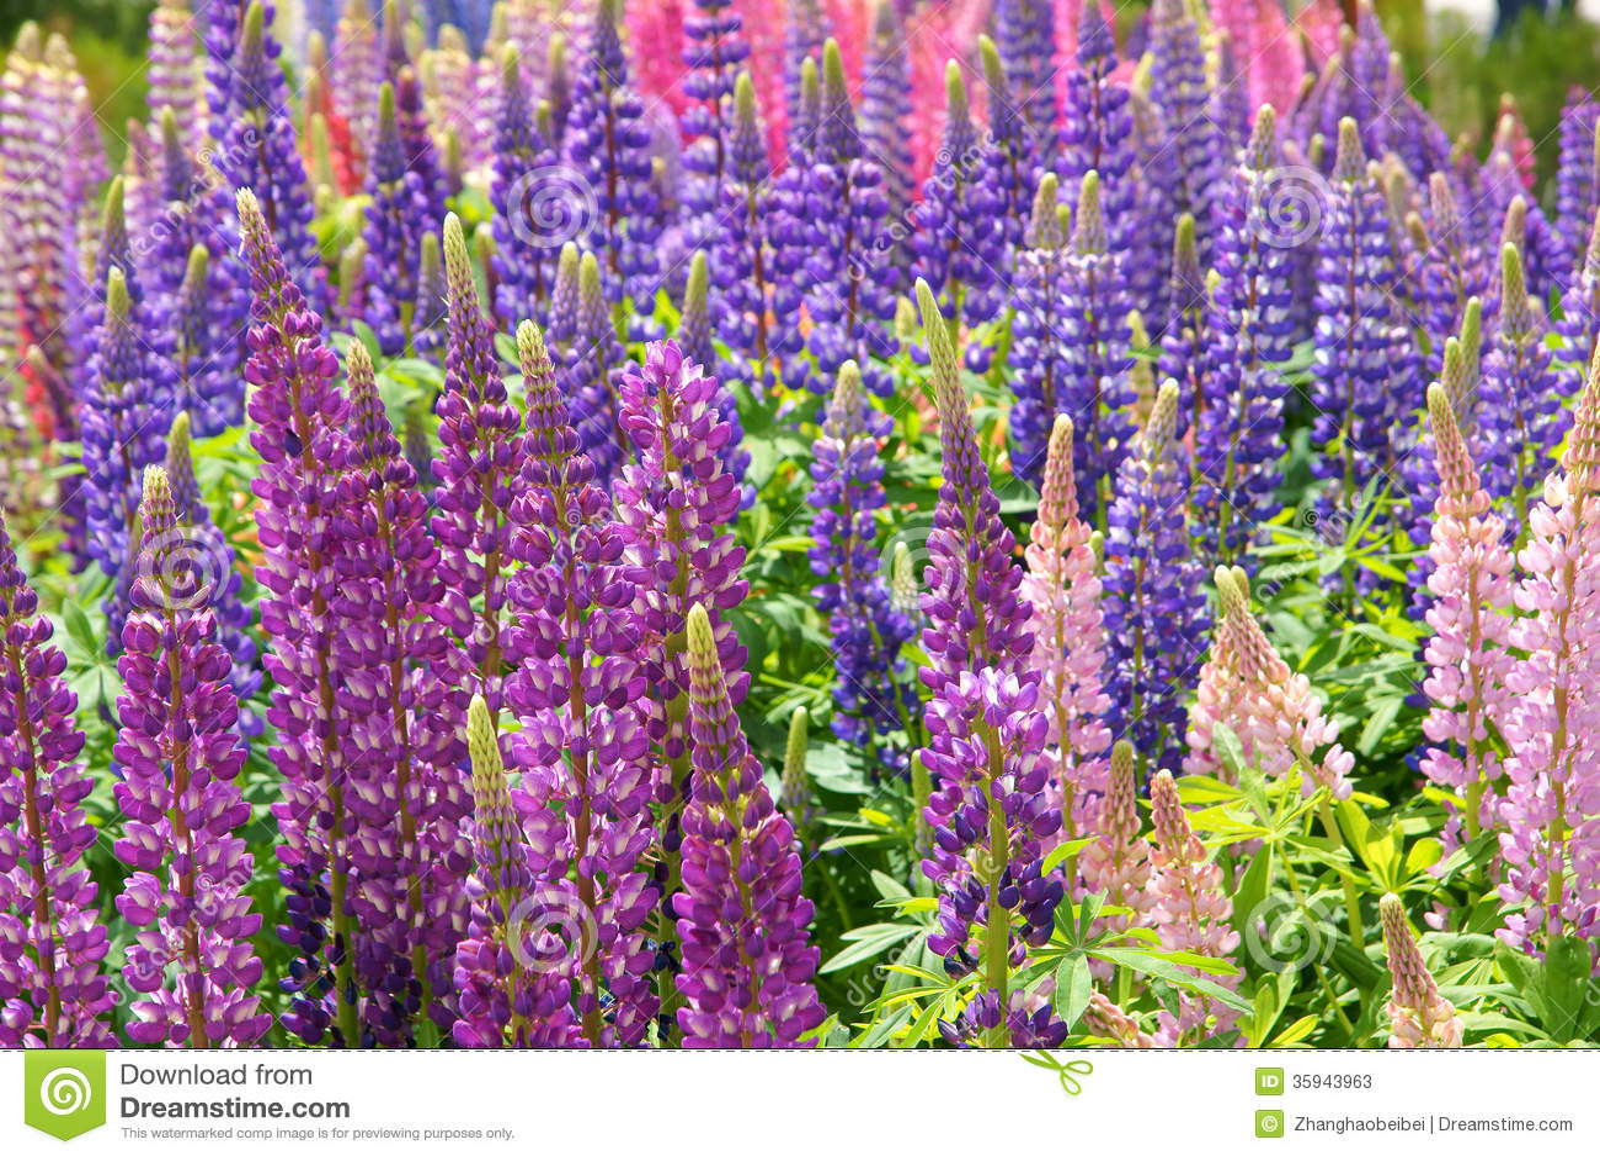 Lupine Flowers Stock s Image